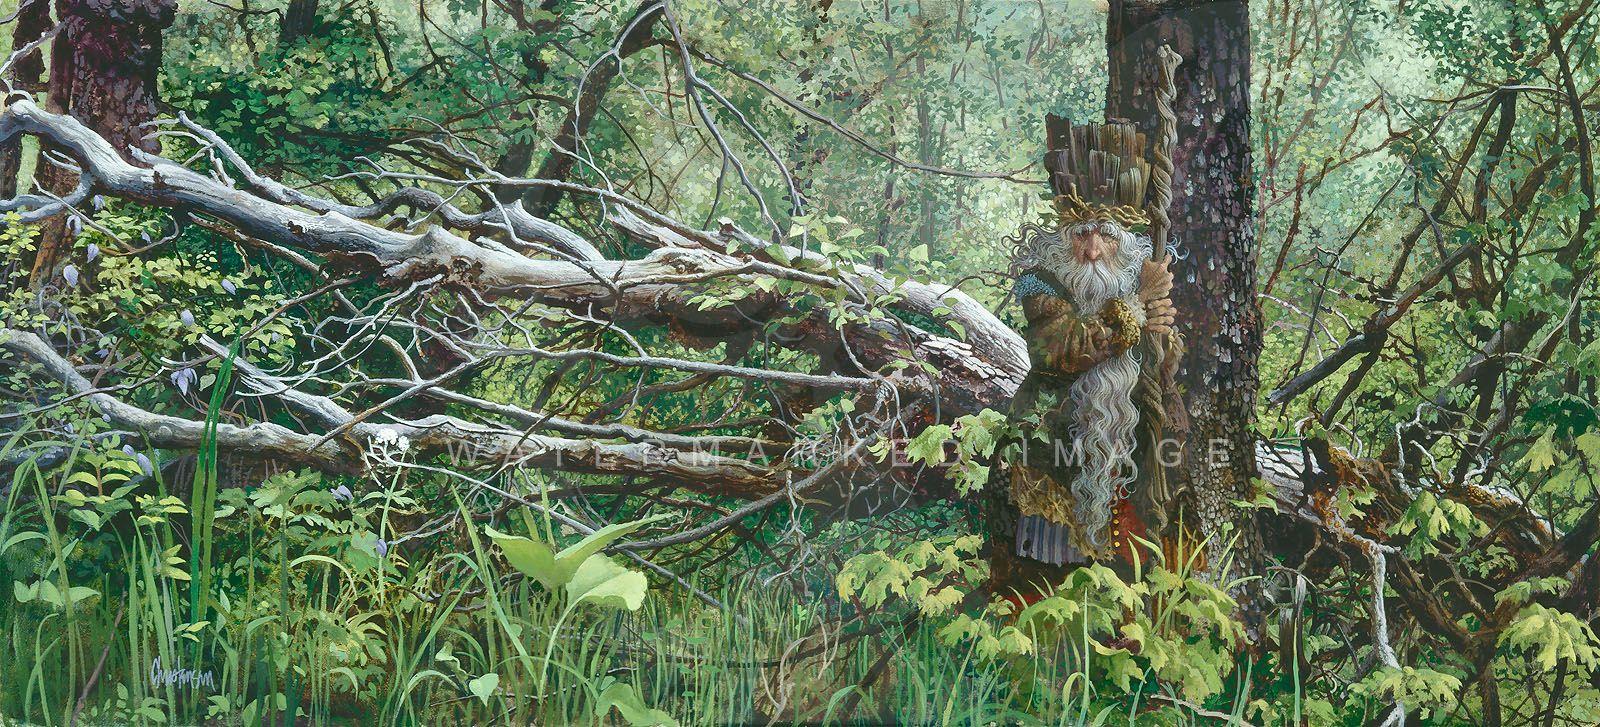 James Christensen Guardian In The Woods By James C Christensen